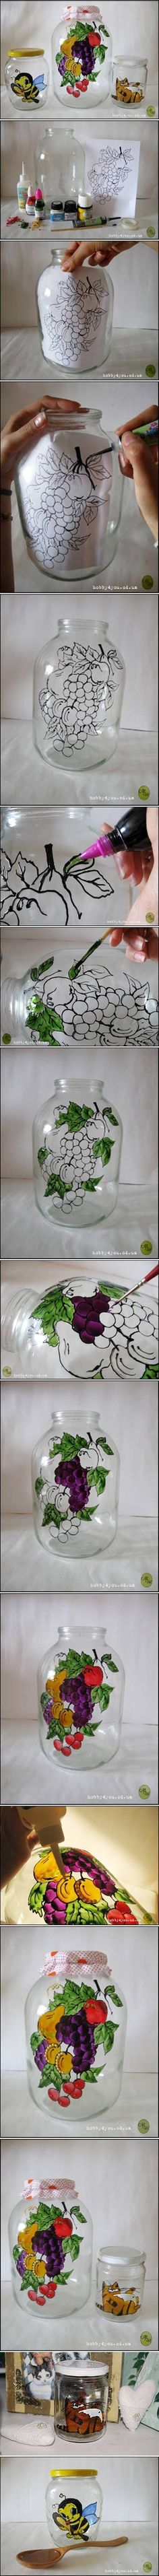 Jar Art DIY